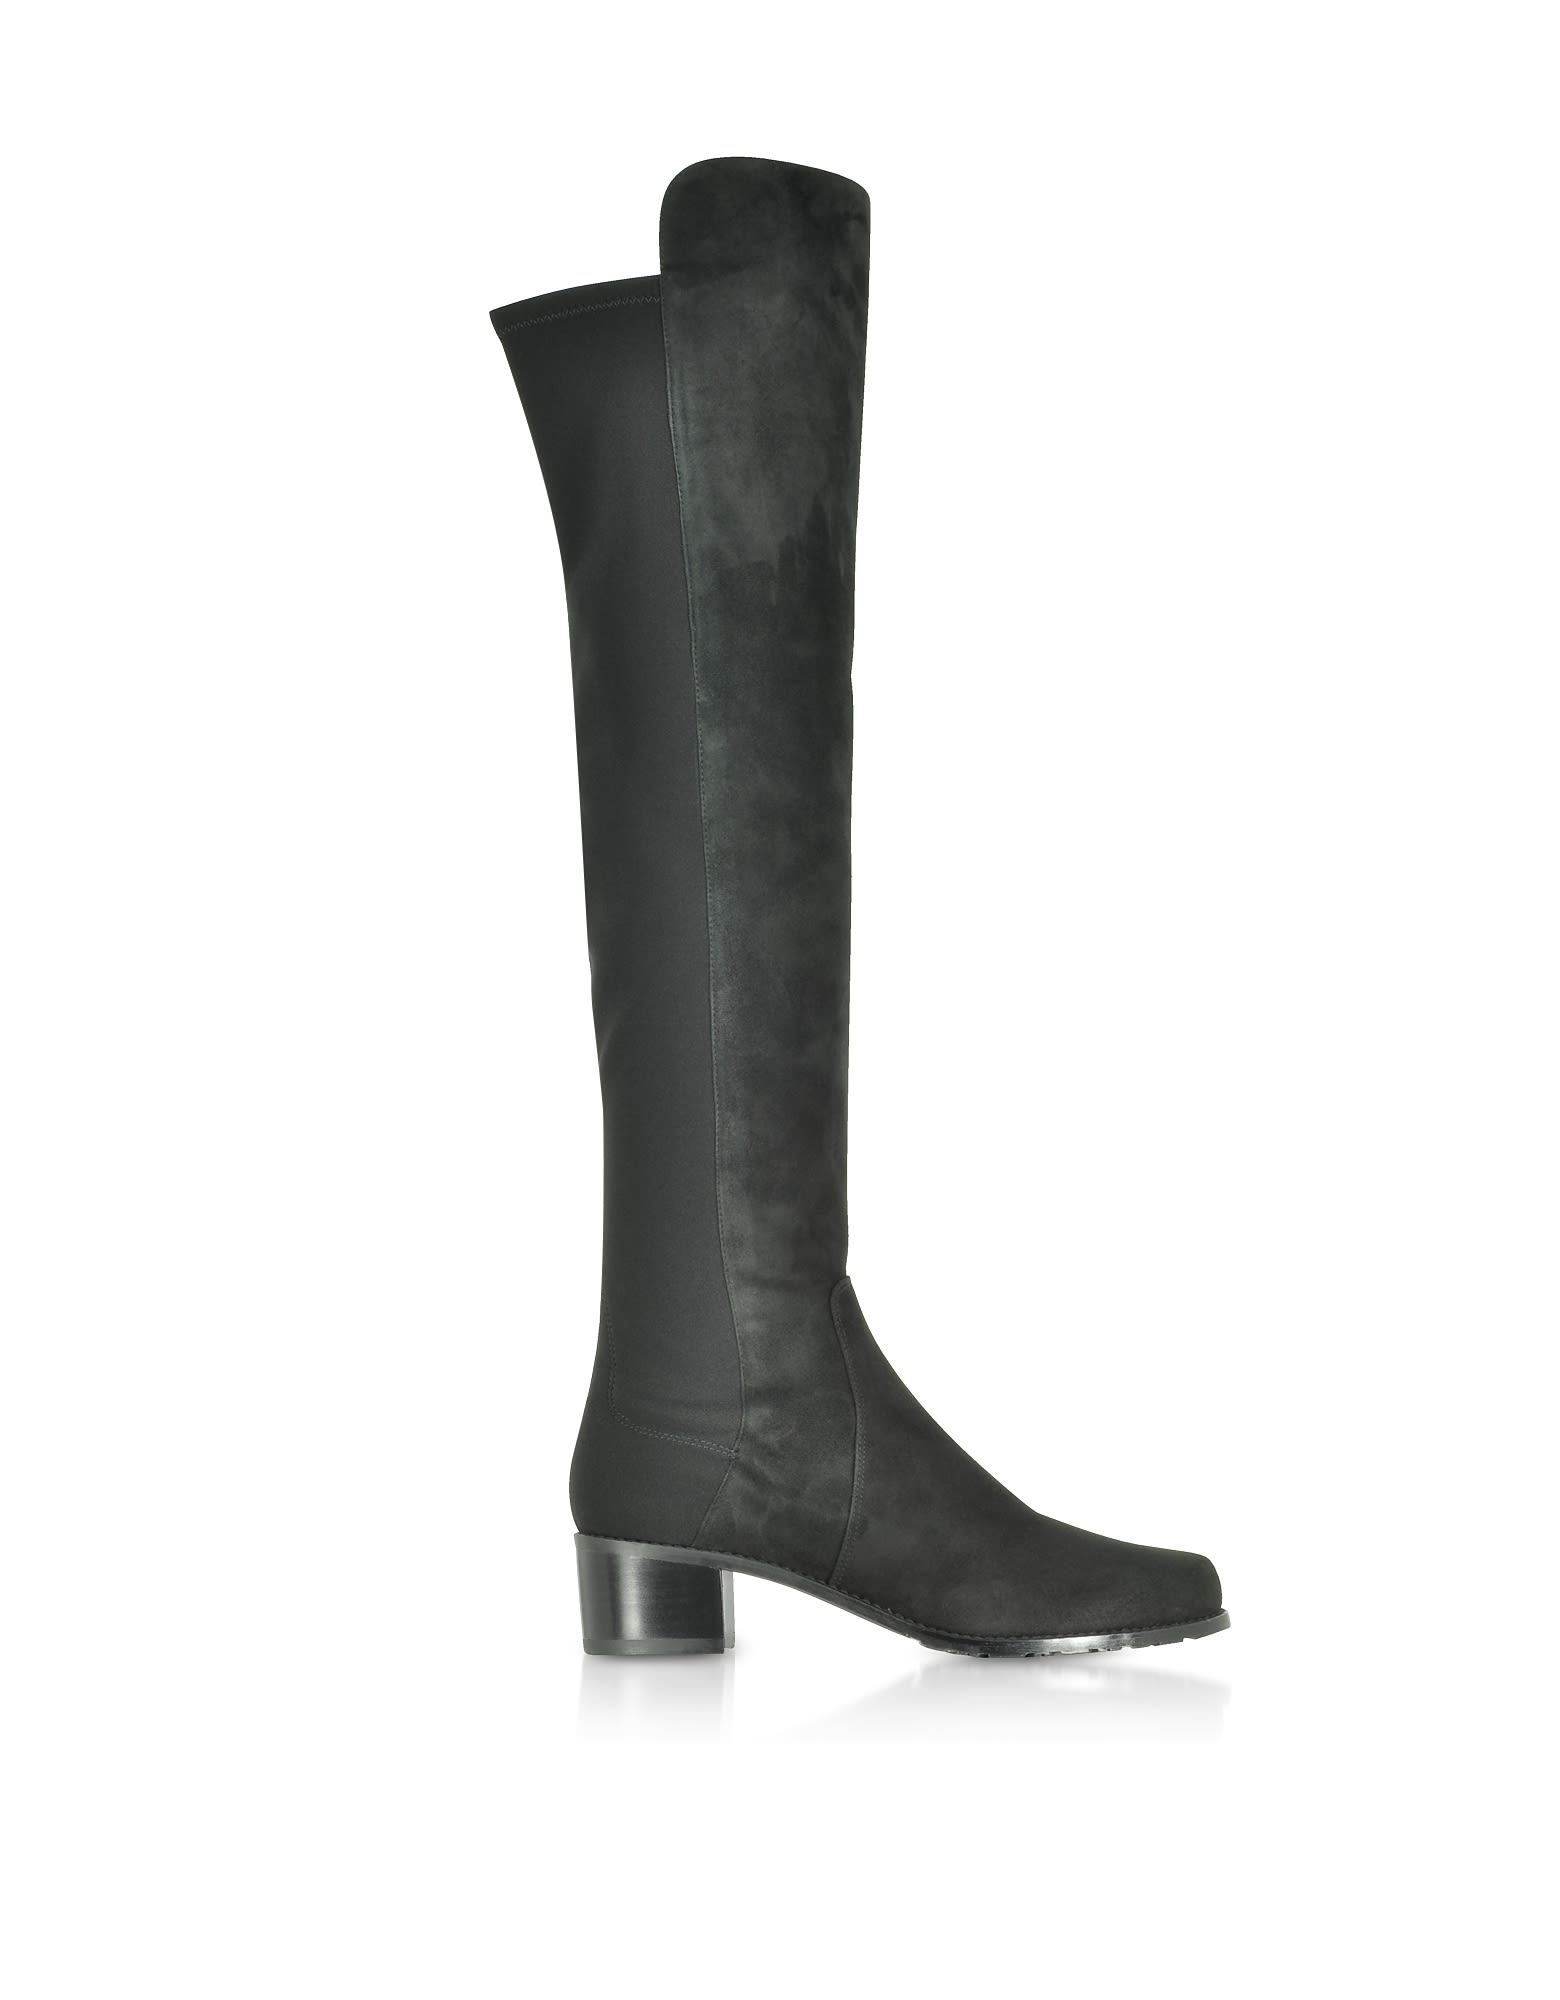 Helena 95 Asphalt Fushion Suede Boots in Graphite